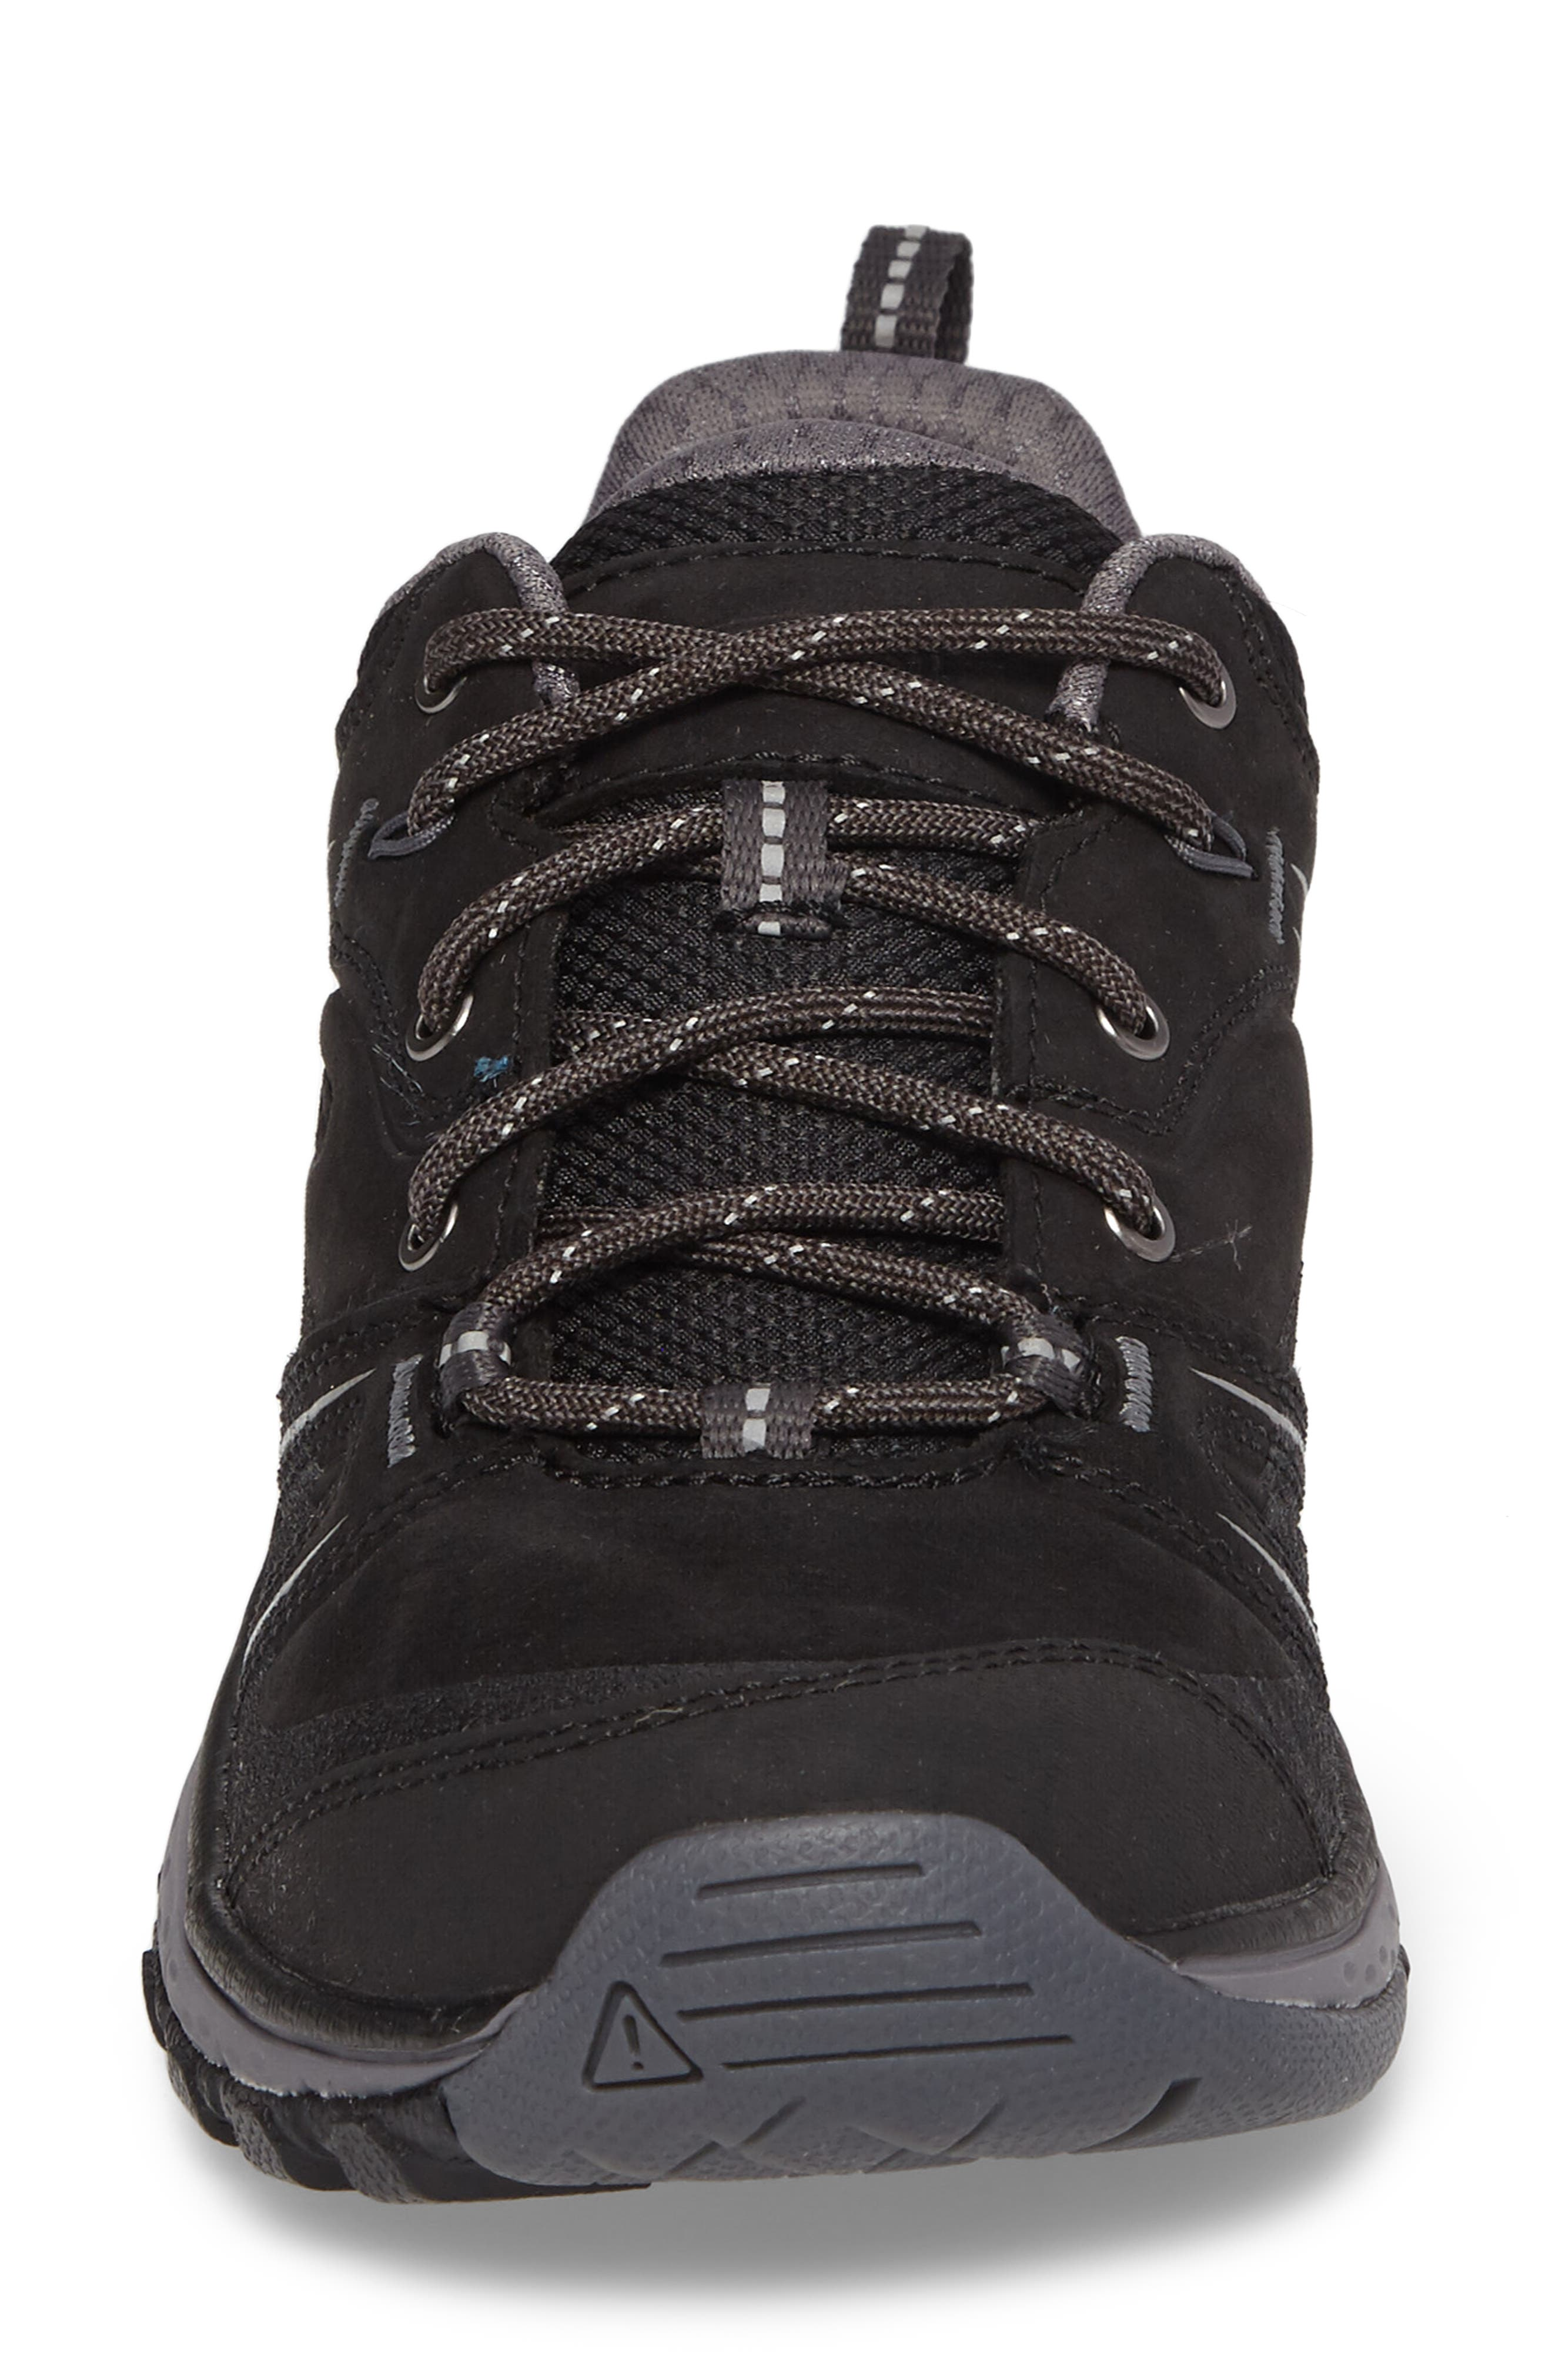 Terradora Waterproof Hiking Shoe,                             Alternate thumbnail 4, color,                             012